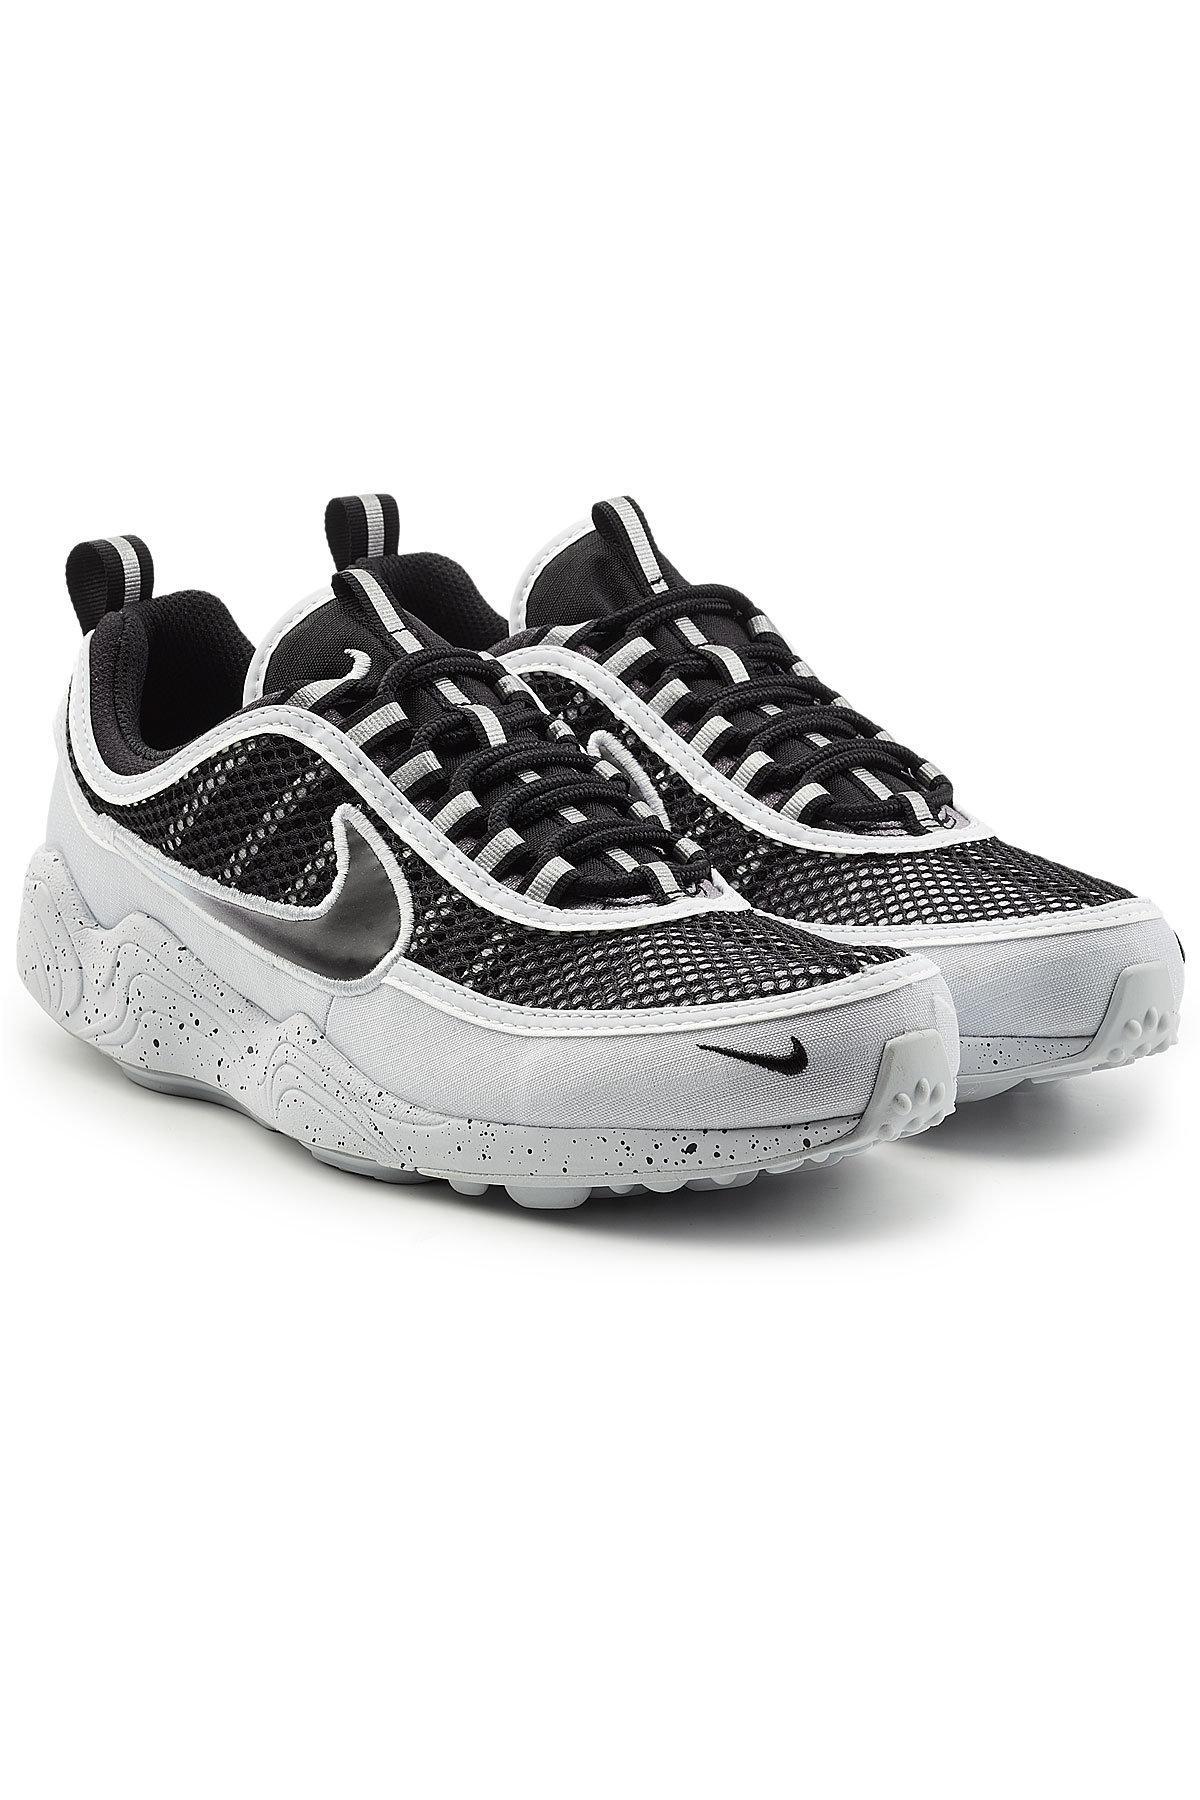 lyst nike air zoom scarpe per gli uomini.